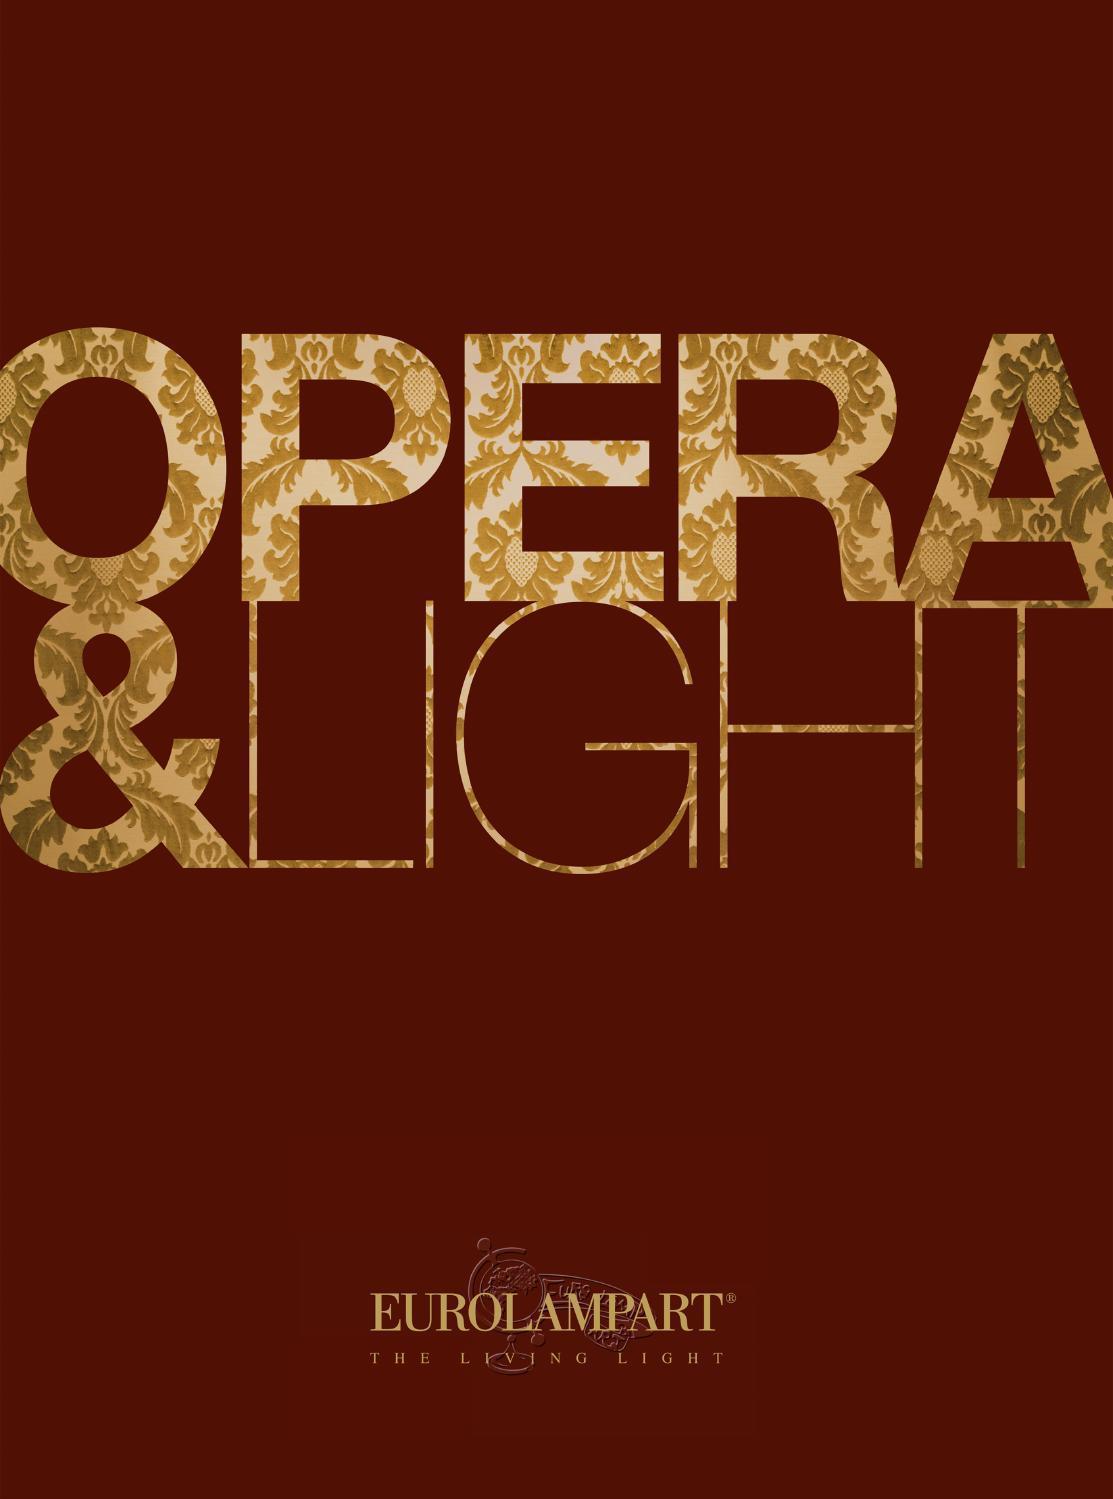 eurolampart 2015年灯灯饰目录:主要介绍工艺灯,欧式灯,吊灯,落地灯